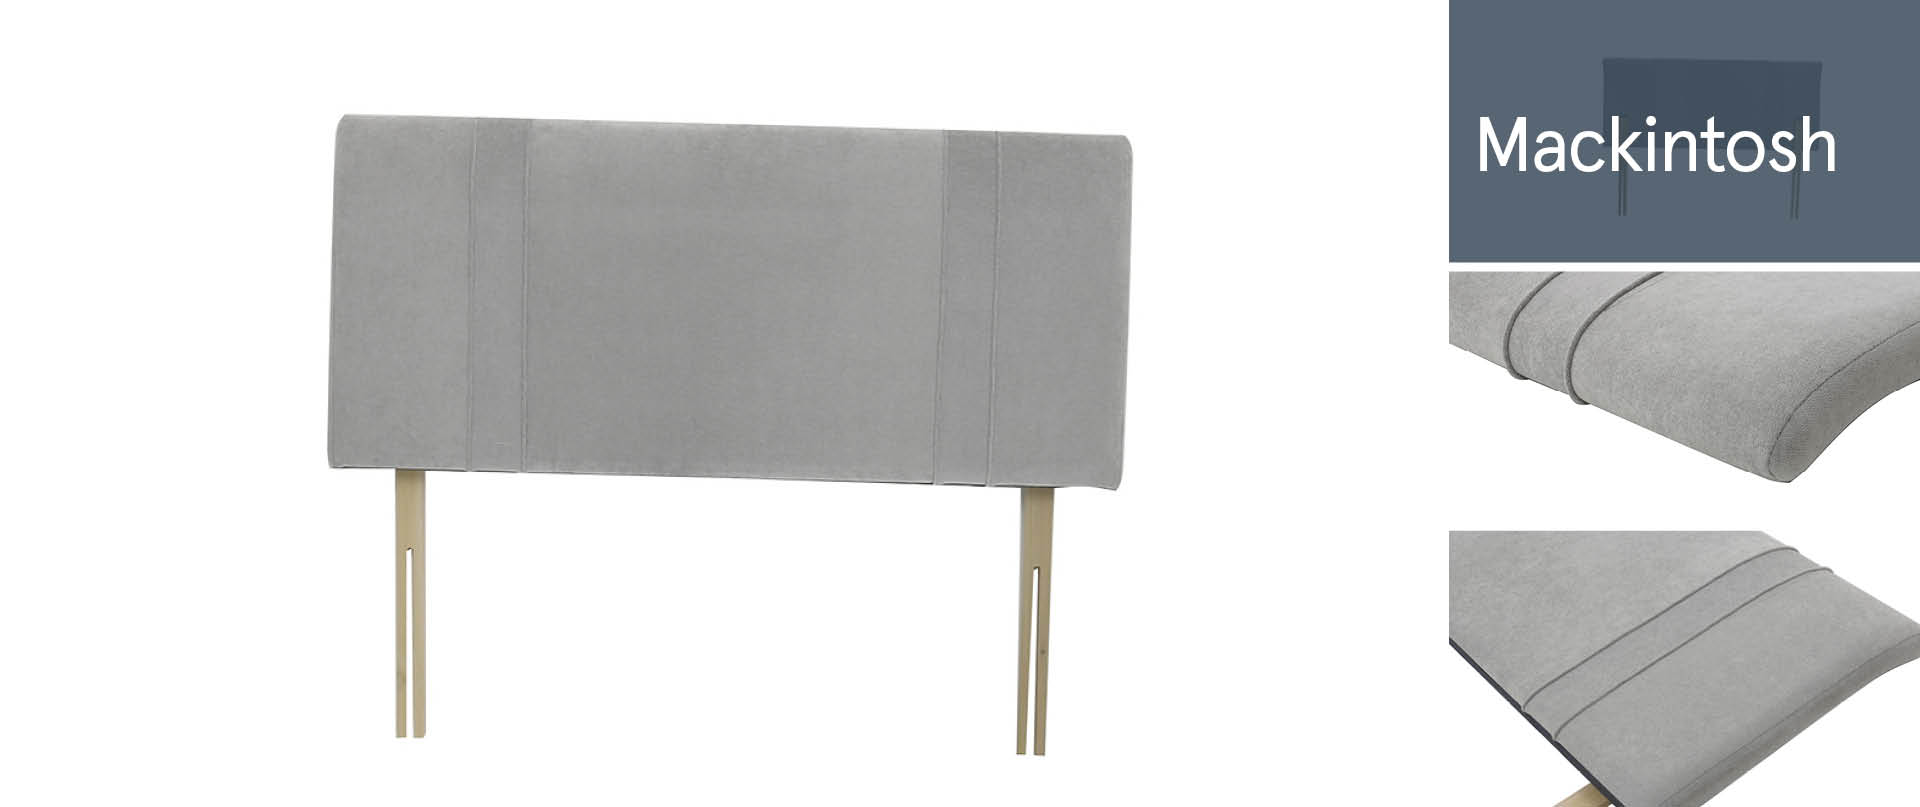 Mackintosh Headboards Ranges